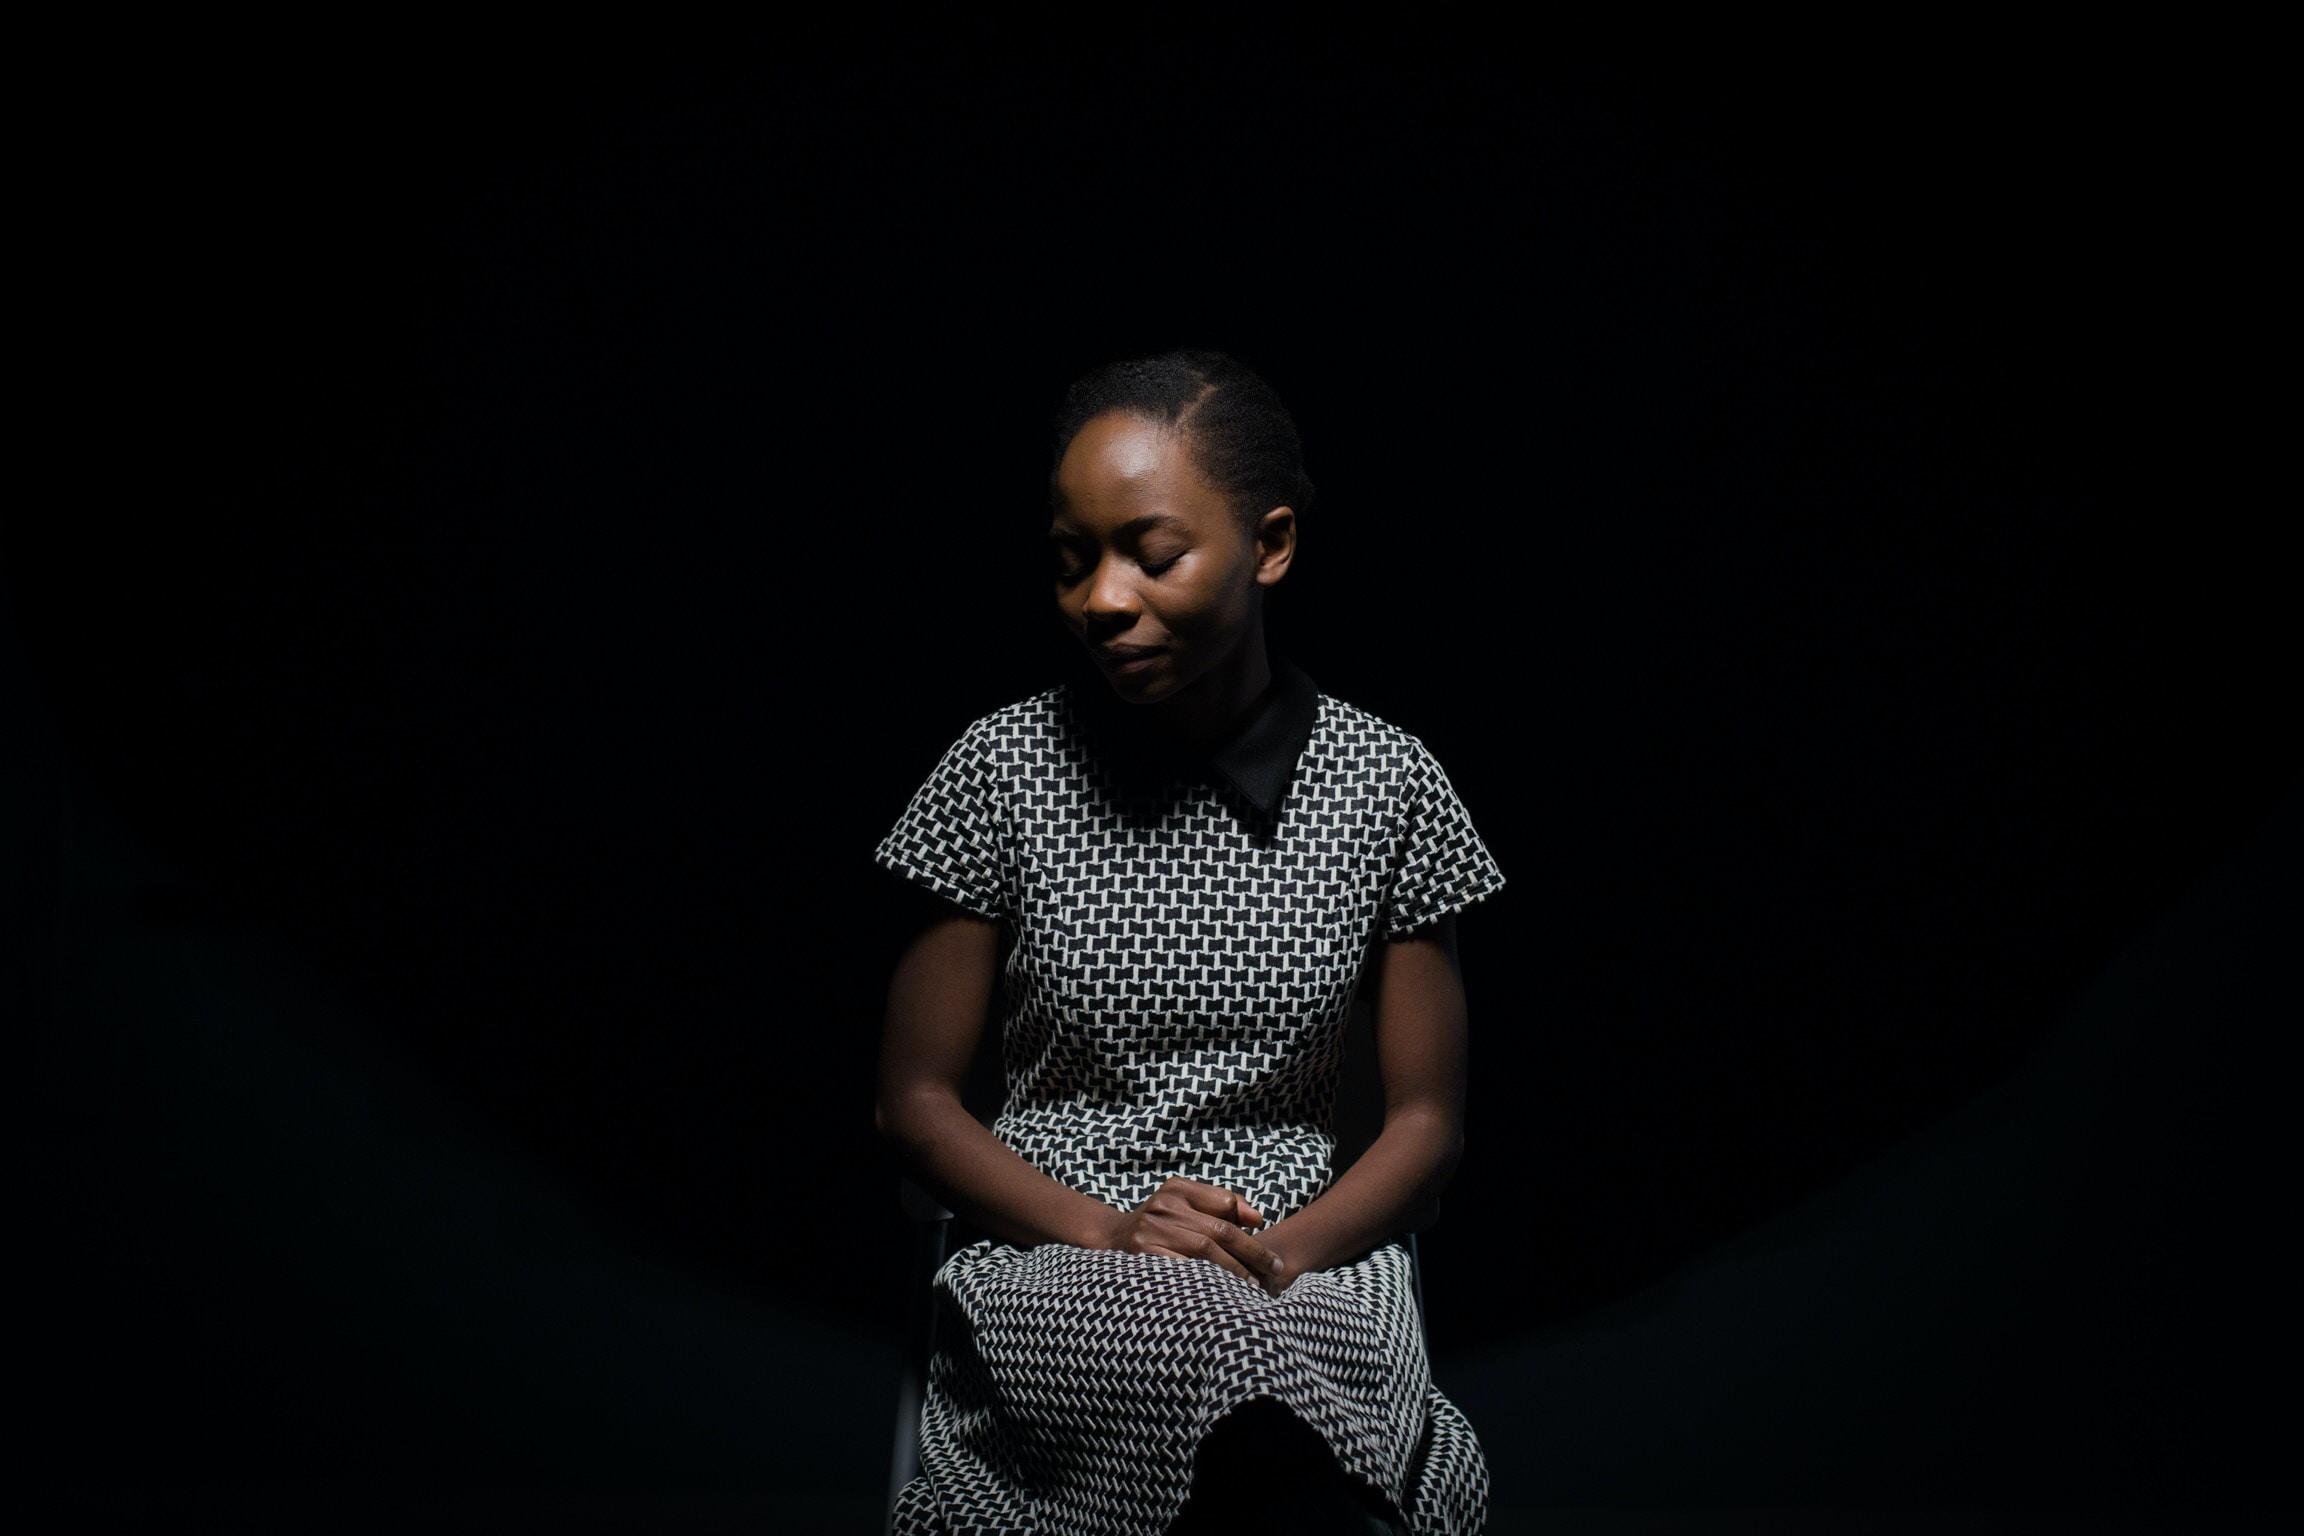 woman sitting on chair inside dark room